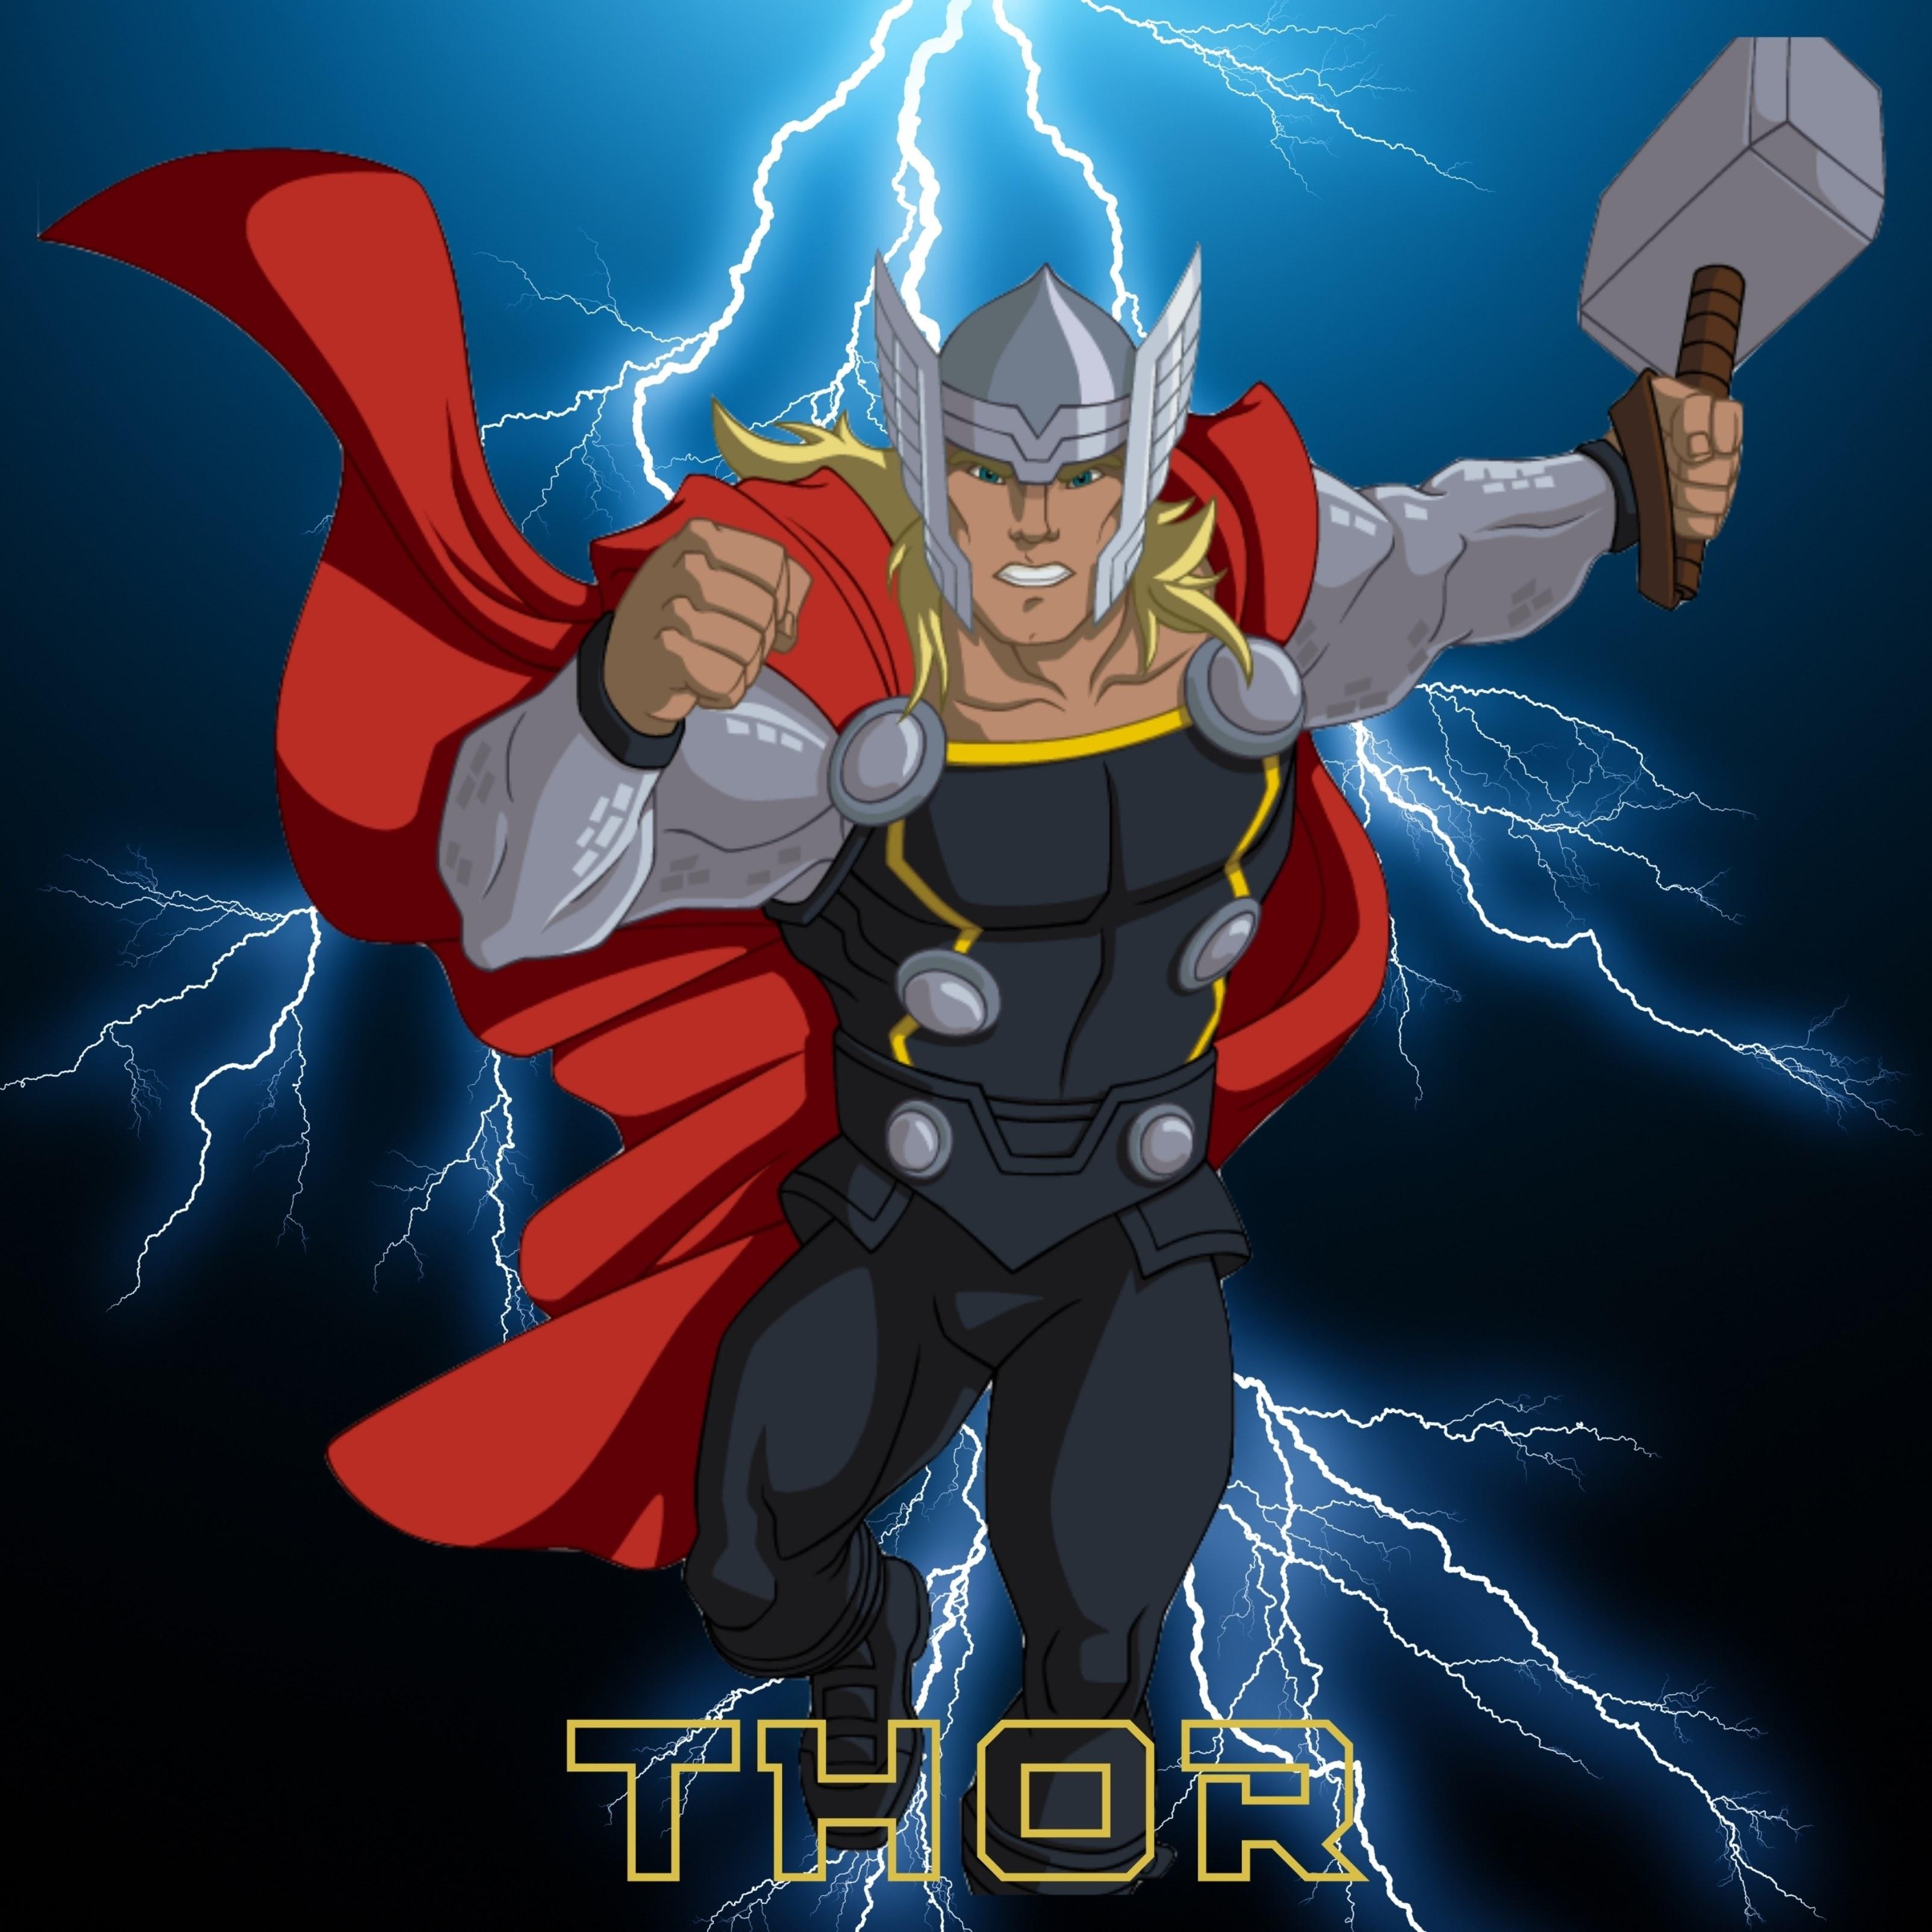 Thor Lightning Background iPad Wallpaper